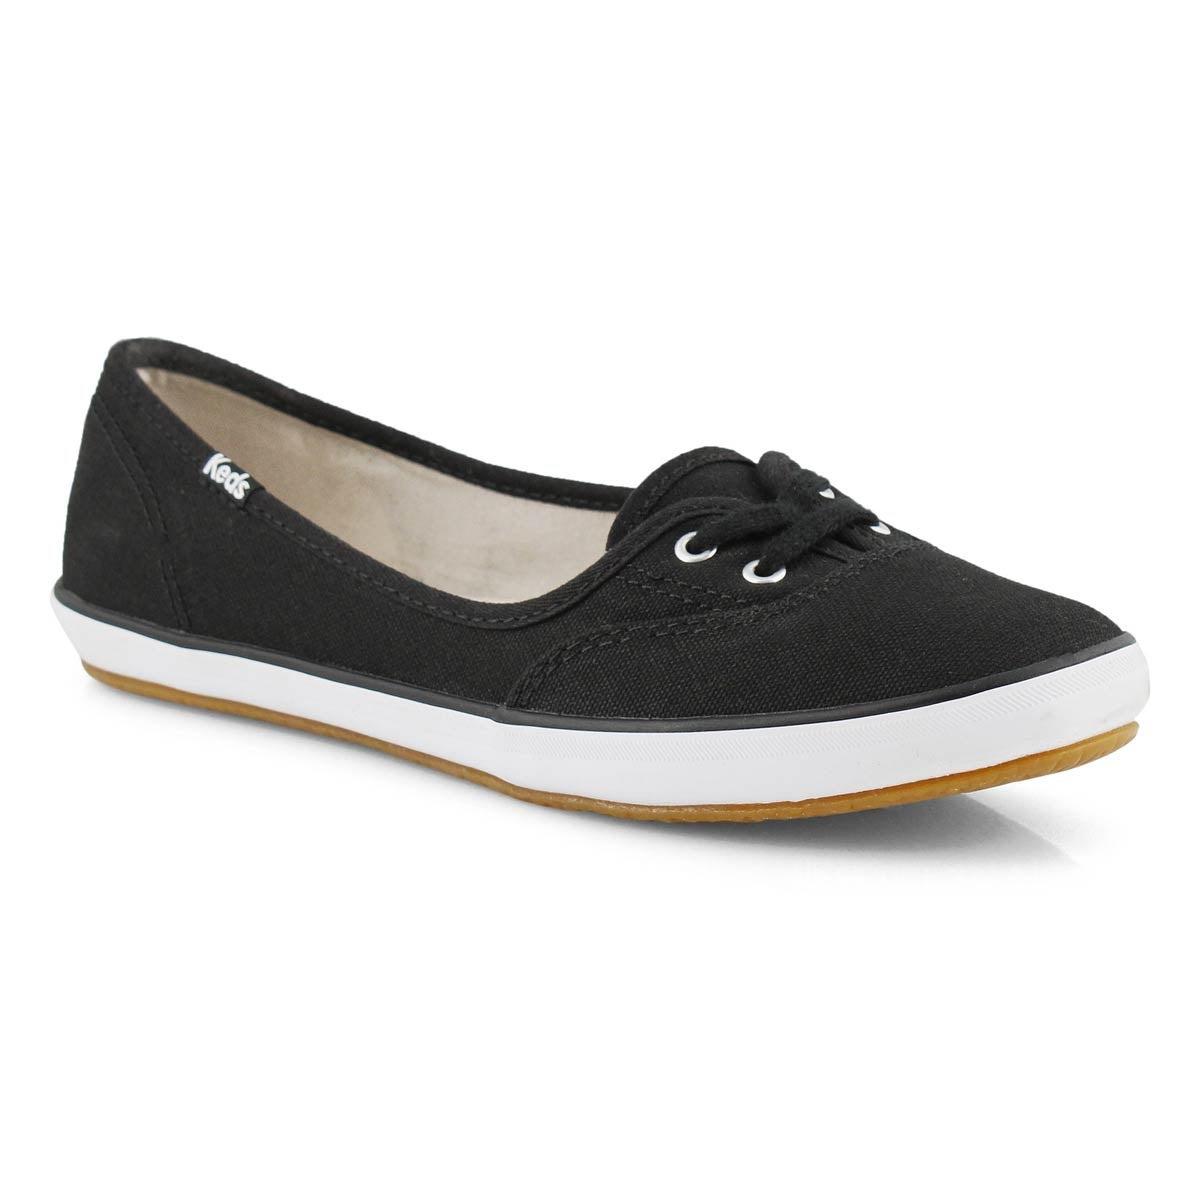 d4d9c2339d Keds Women's TEACUP TWILLL black slip on shoe   Softmoc.com